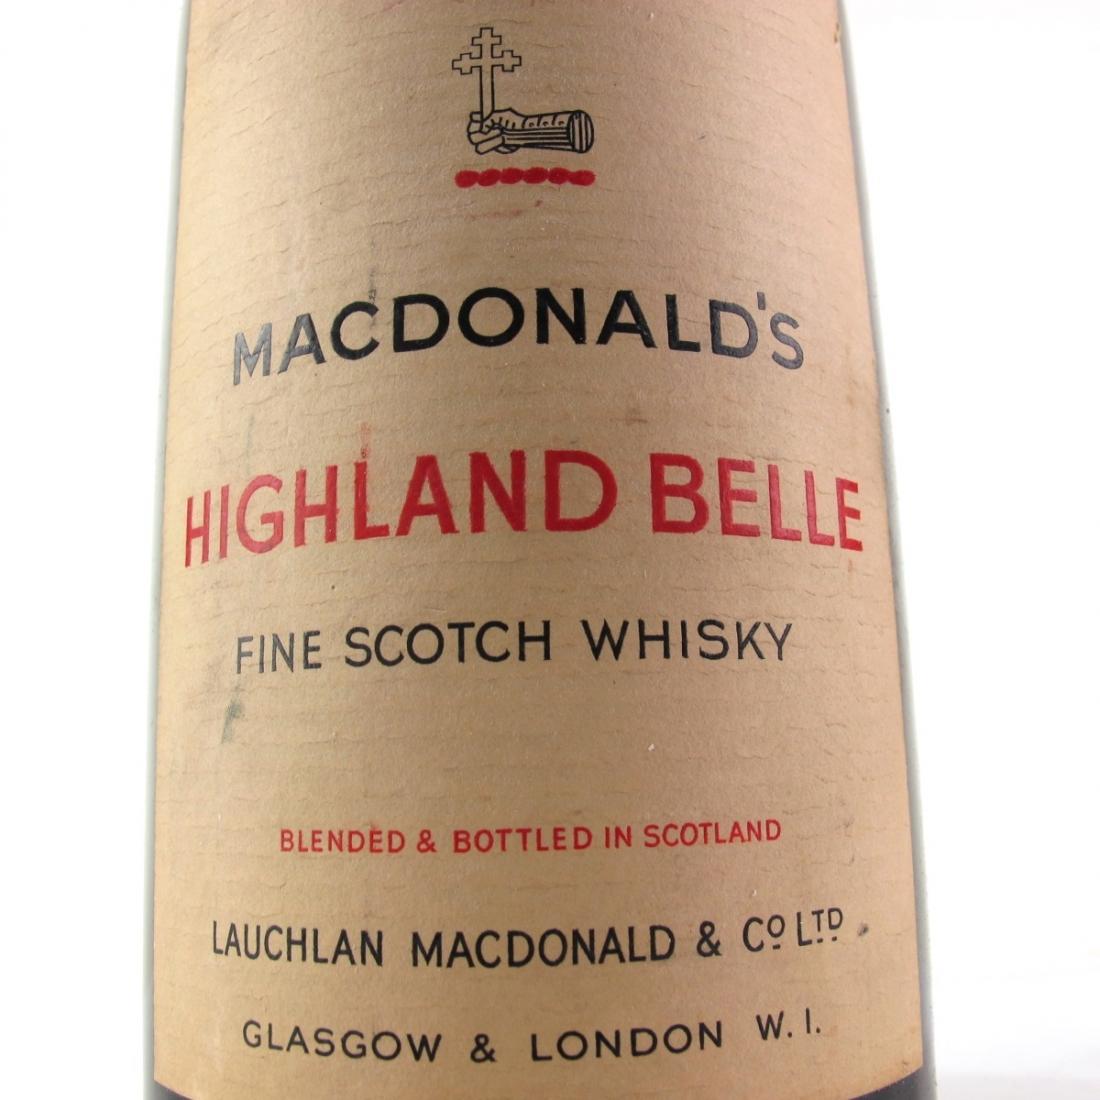 MacDonald's Highland Belle 1940s/50s